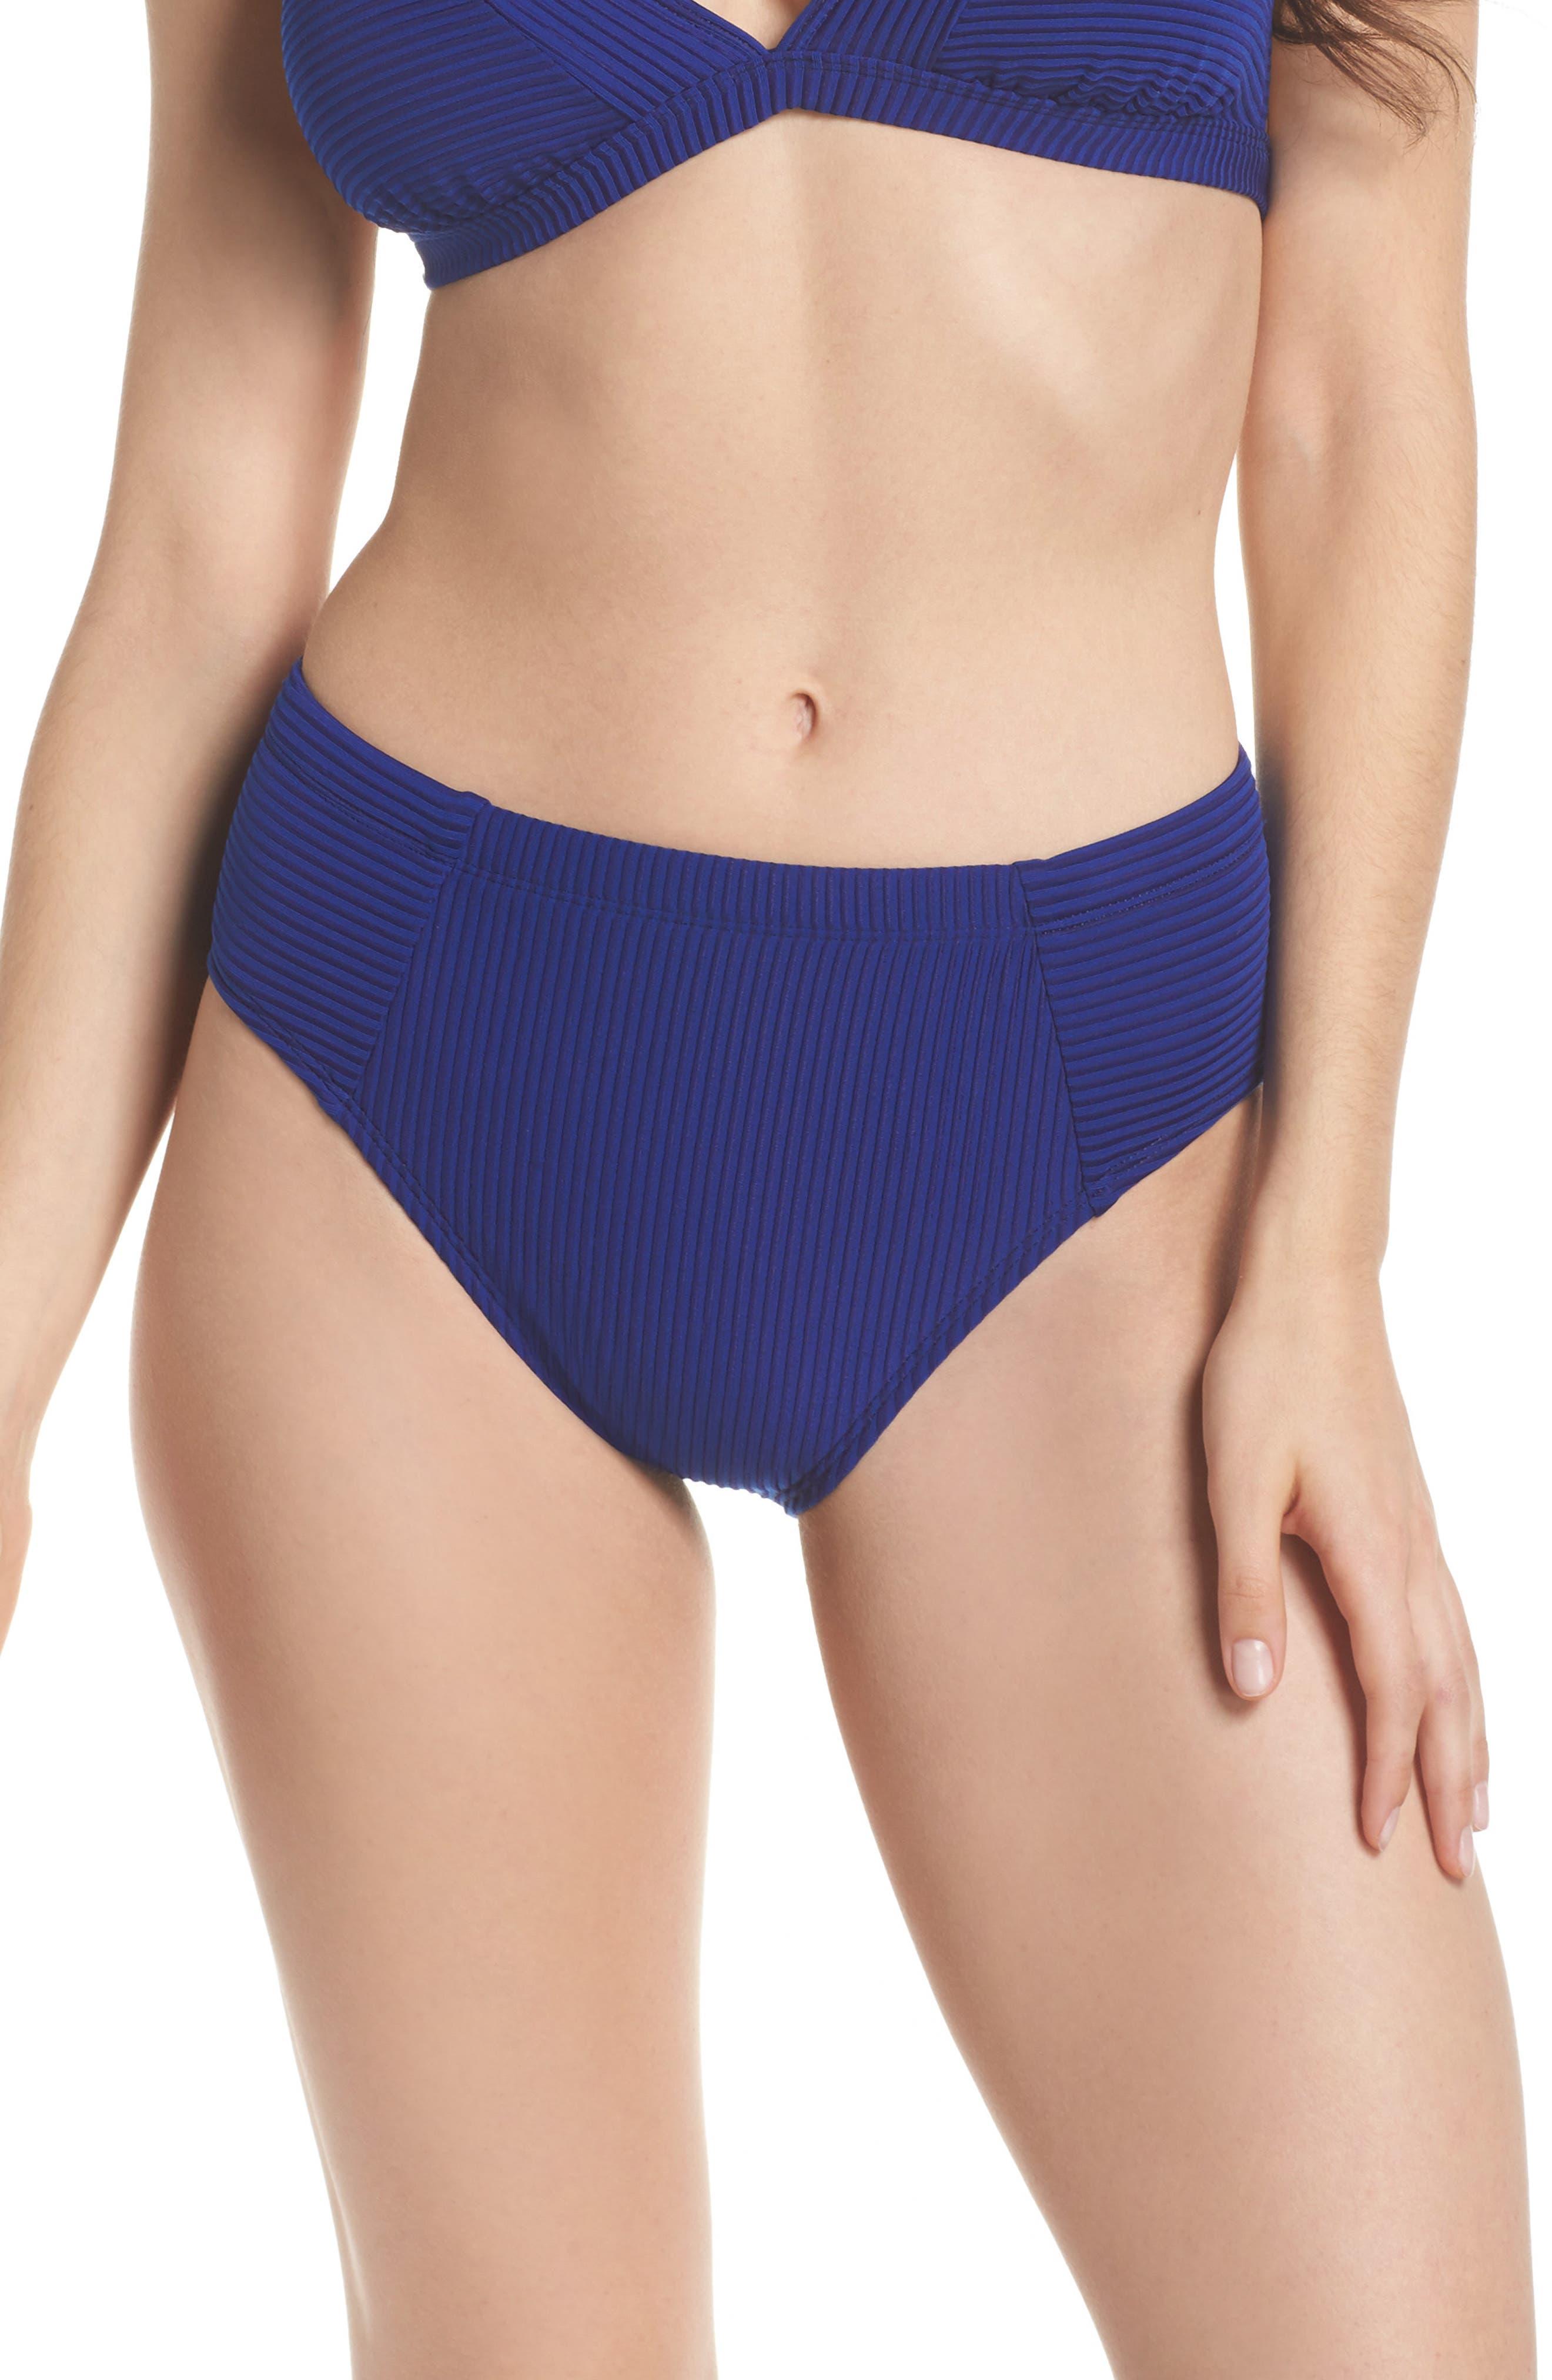 Becca High Waist Bikini Bottoms,                             Main thumbnail 1, color,                             Apollo Blue